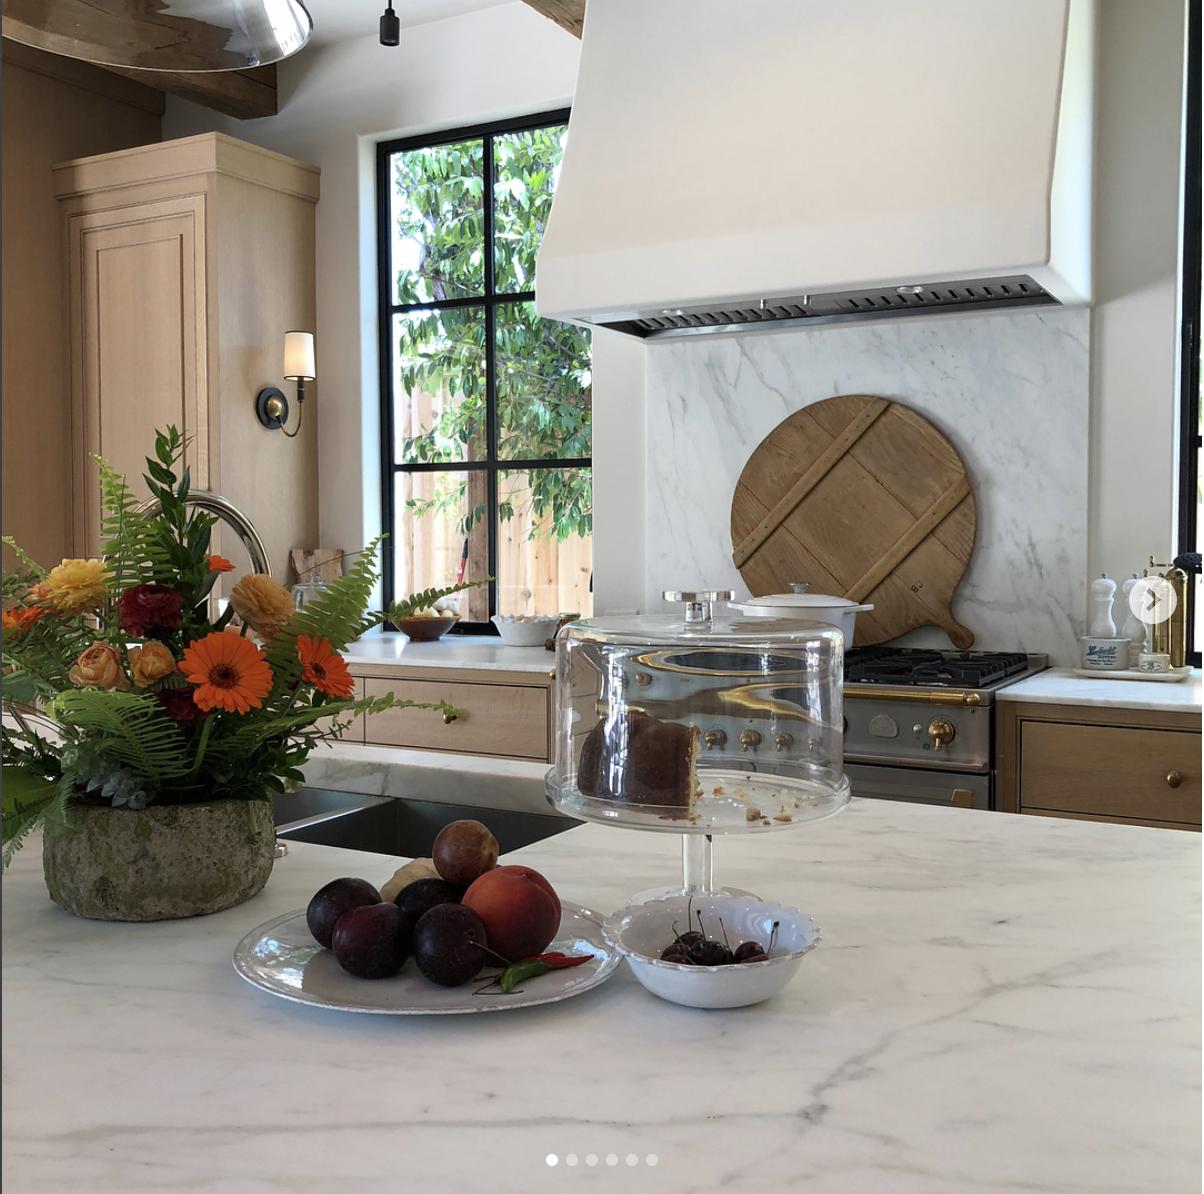 Pin By Komorebi On Mountain View Kitchen House Design Home Decor